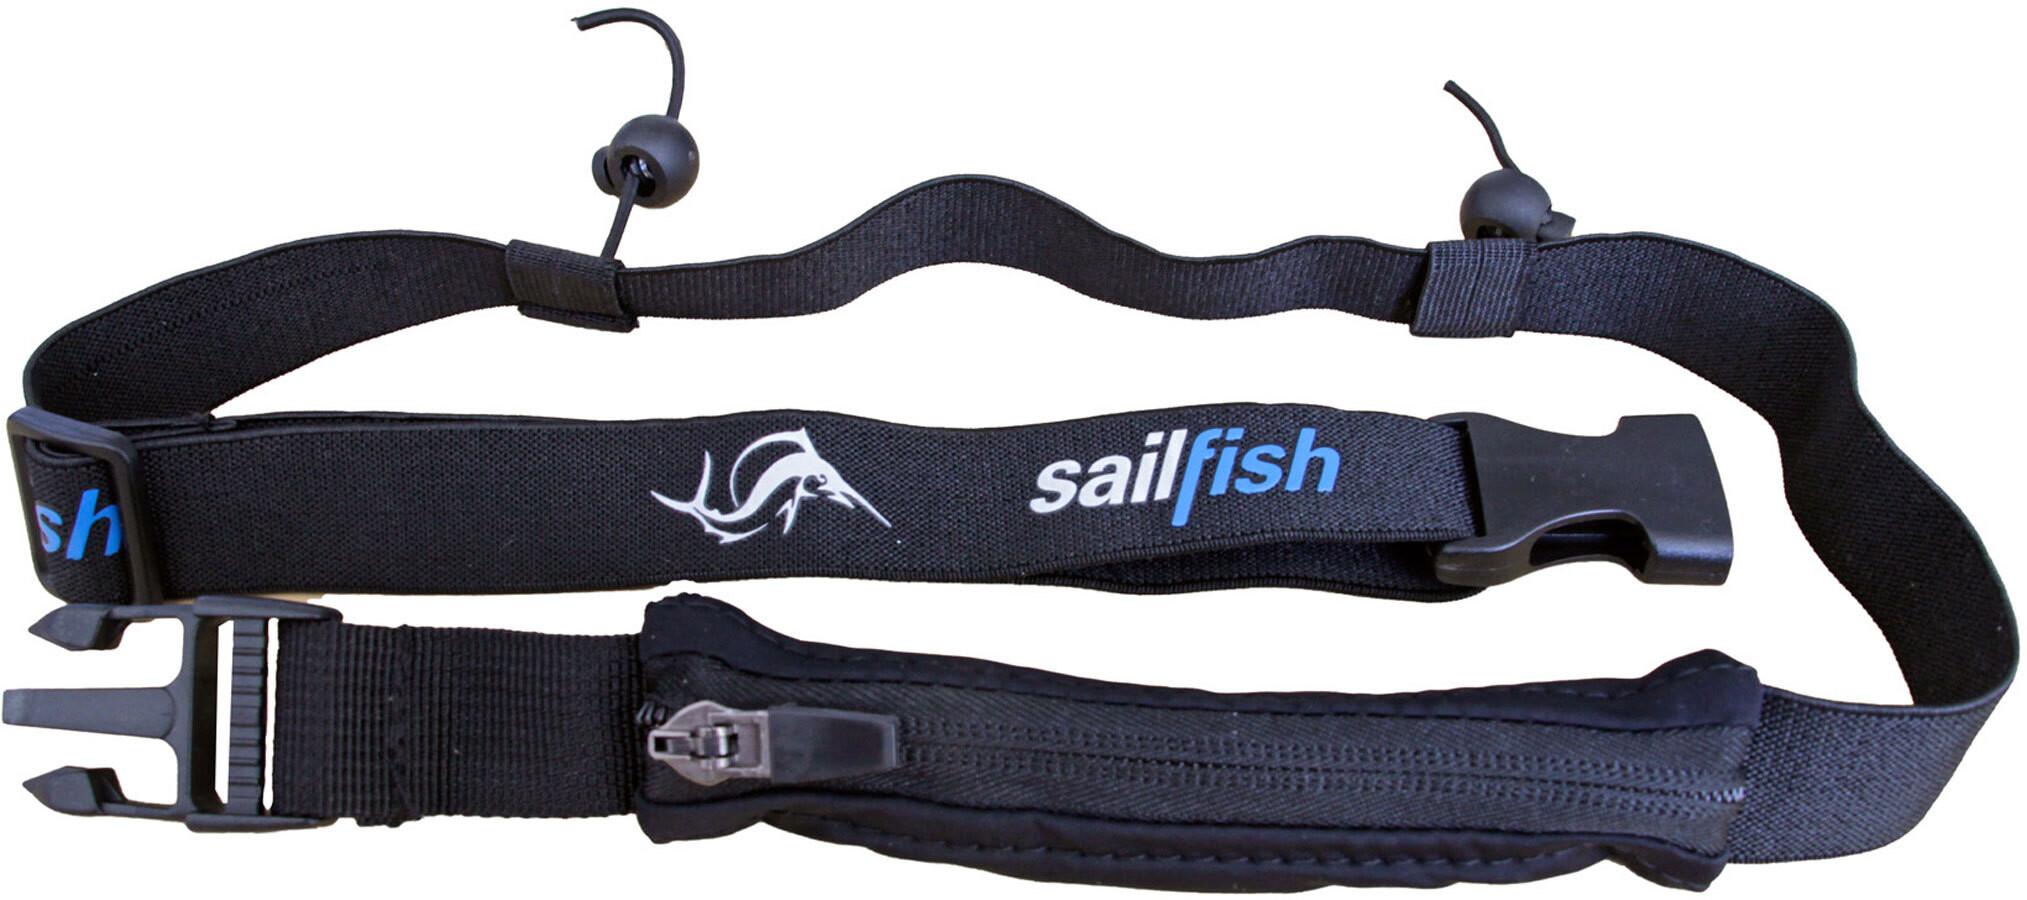 sailfish Racenumberbelt Pocket, black (2019)   misc_clothes